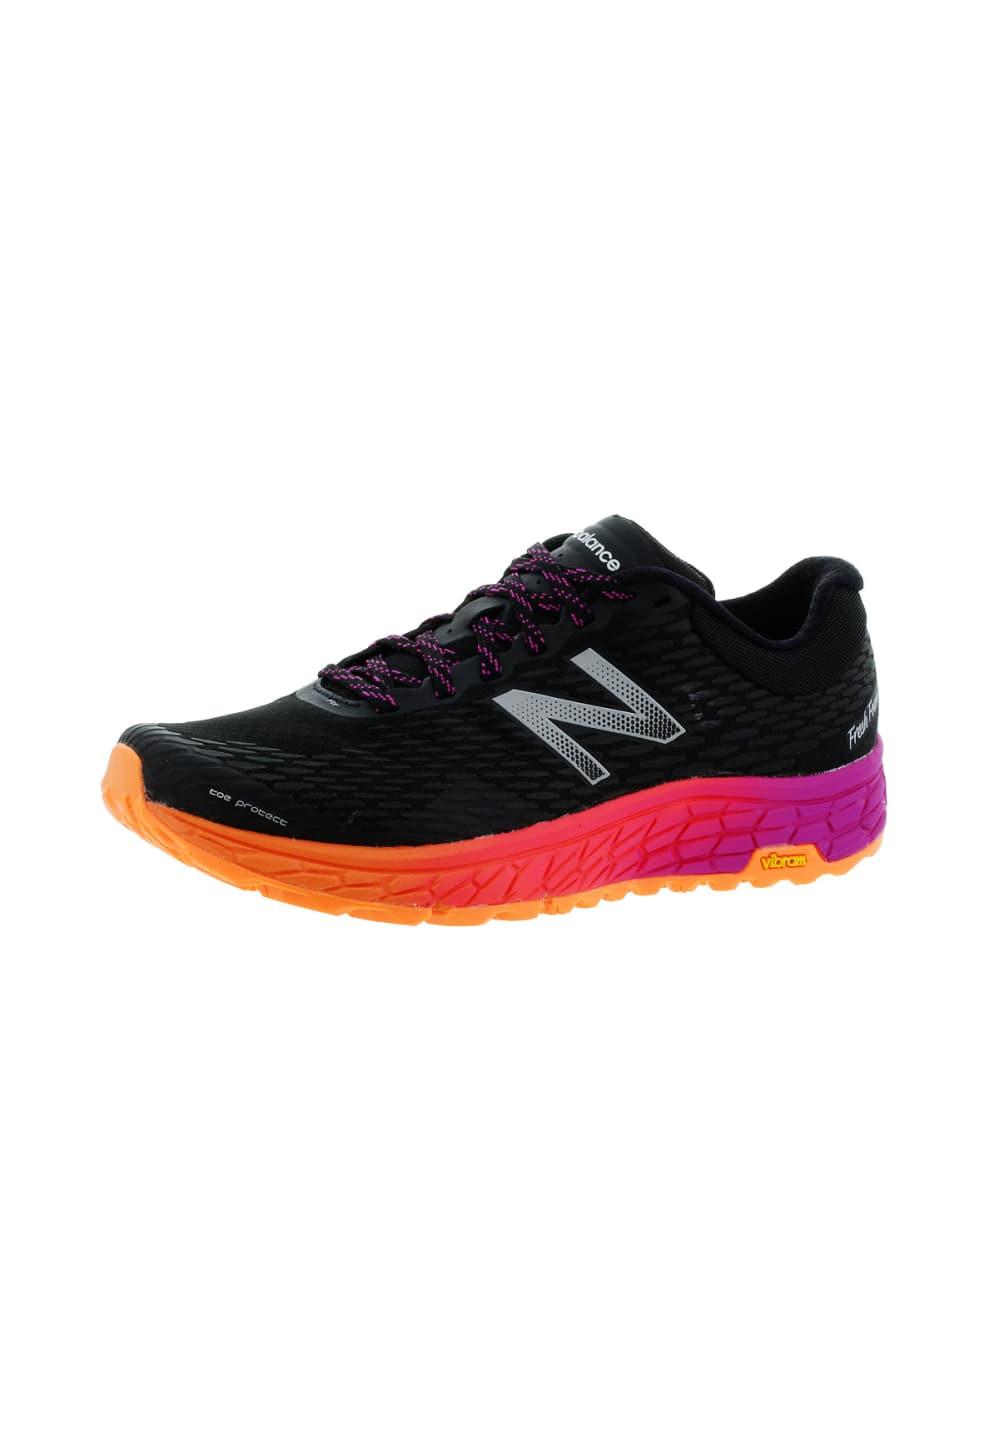 30ffff68c28ec New Balance Fresh Foam Hierro - Running shoes for Women - Black | 21RUN